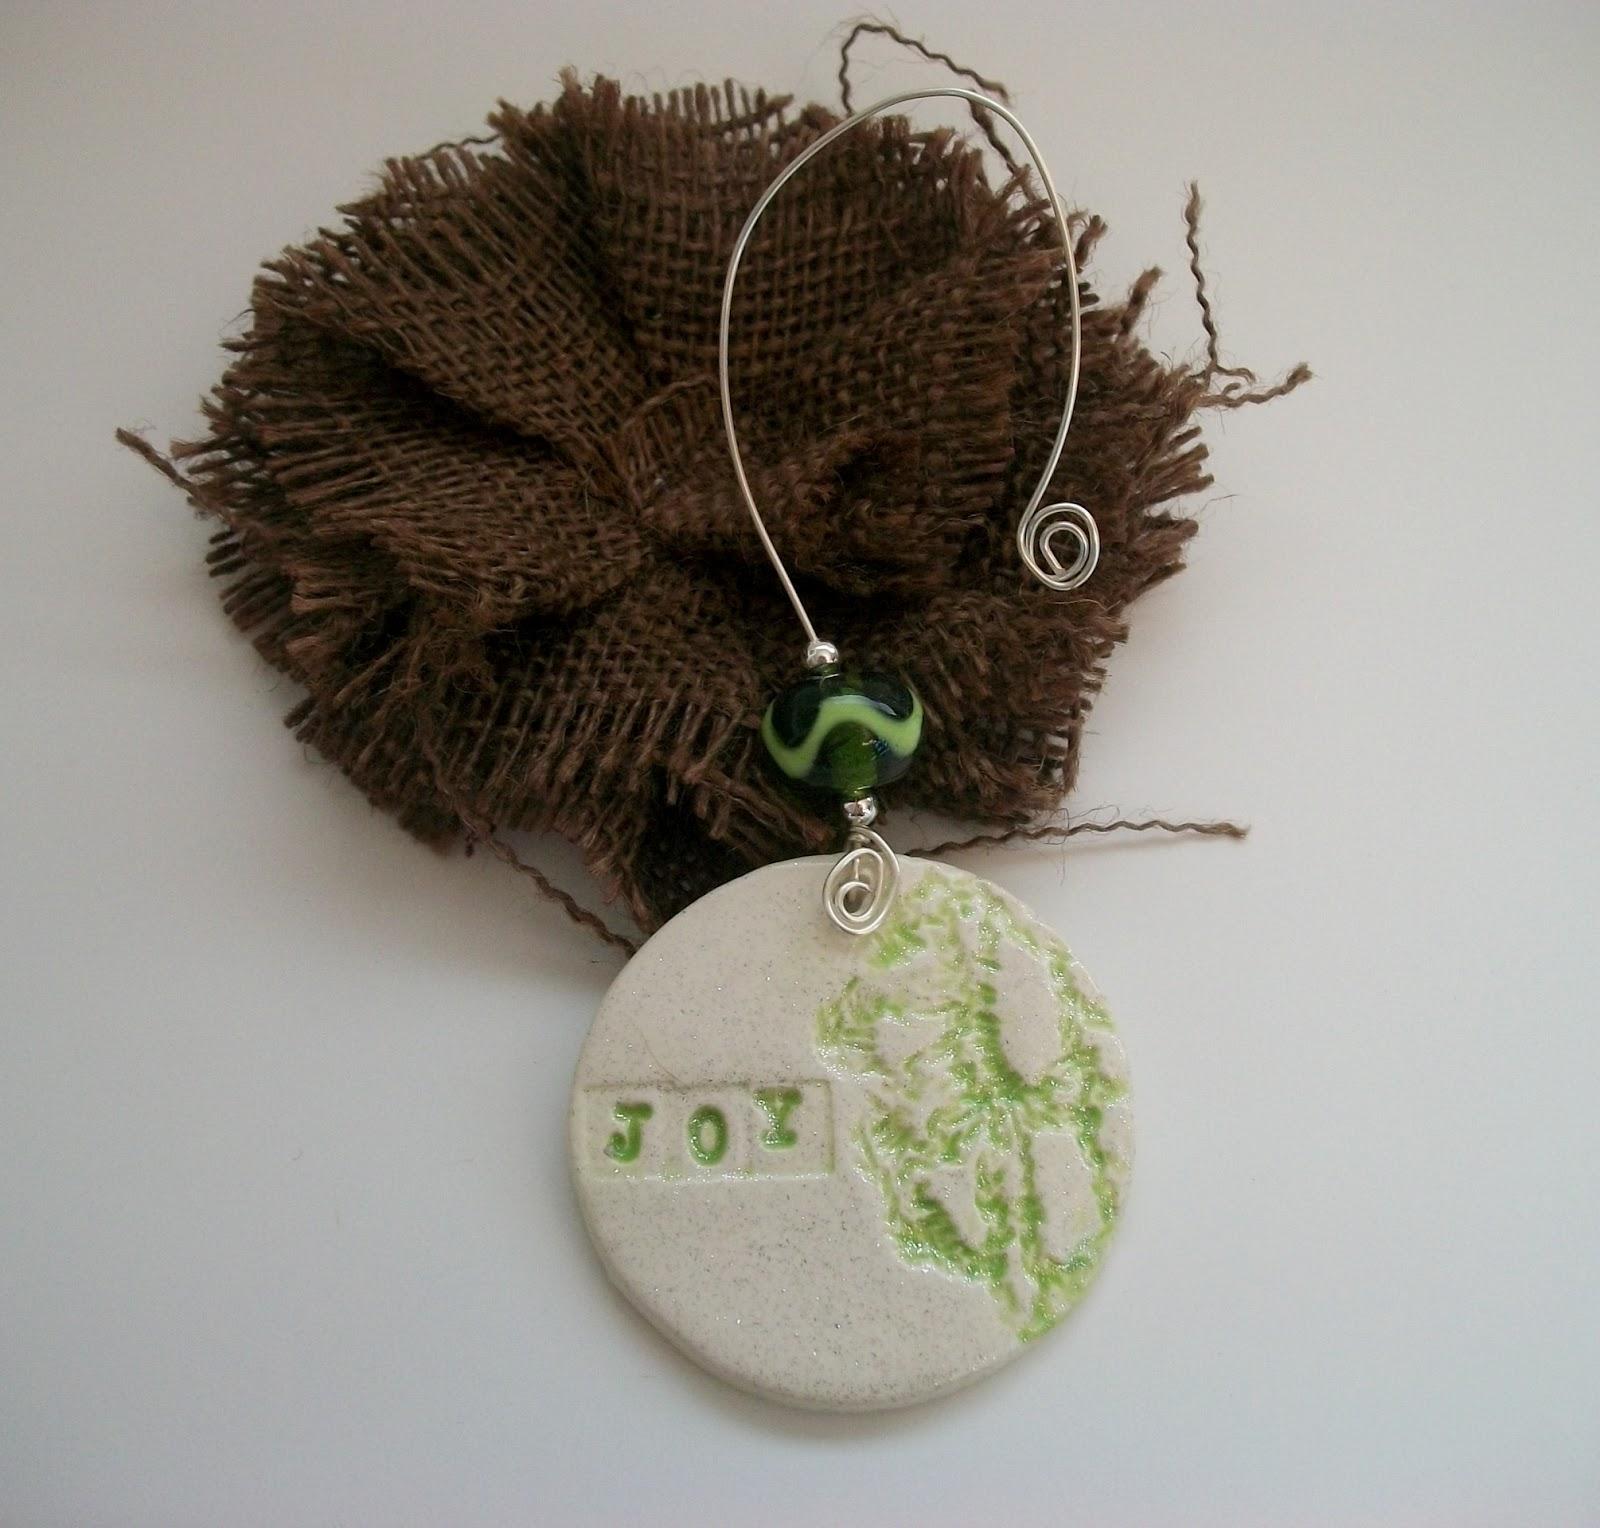 duncan kiln wiring diagram mitsubishi triton stereo art bead scene blog inside the studio with michelle from